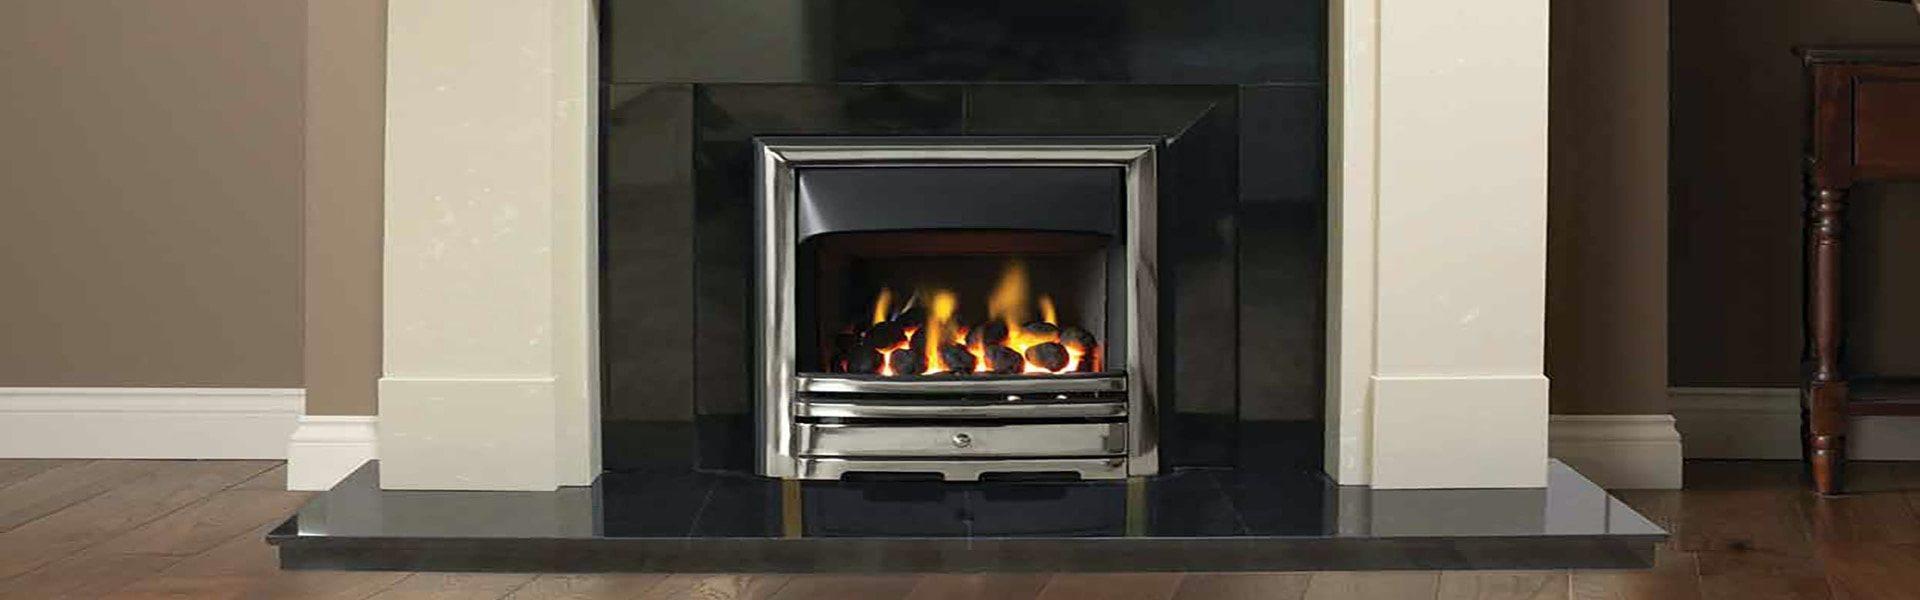 Fireplace Essentials